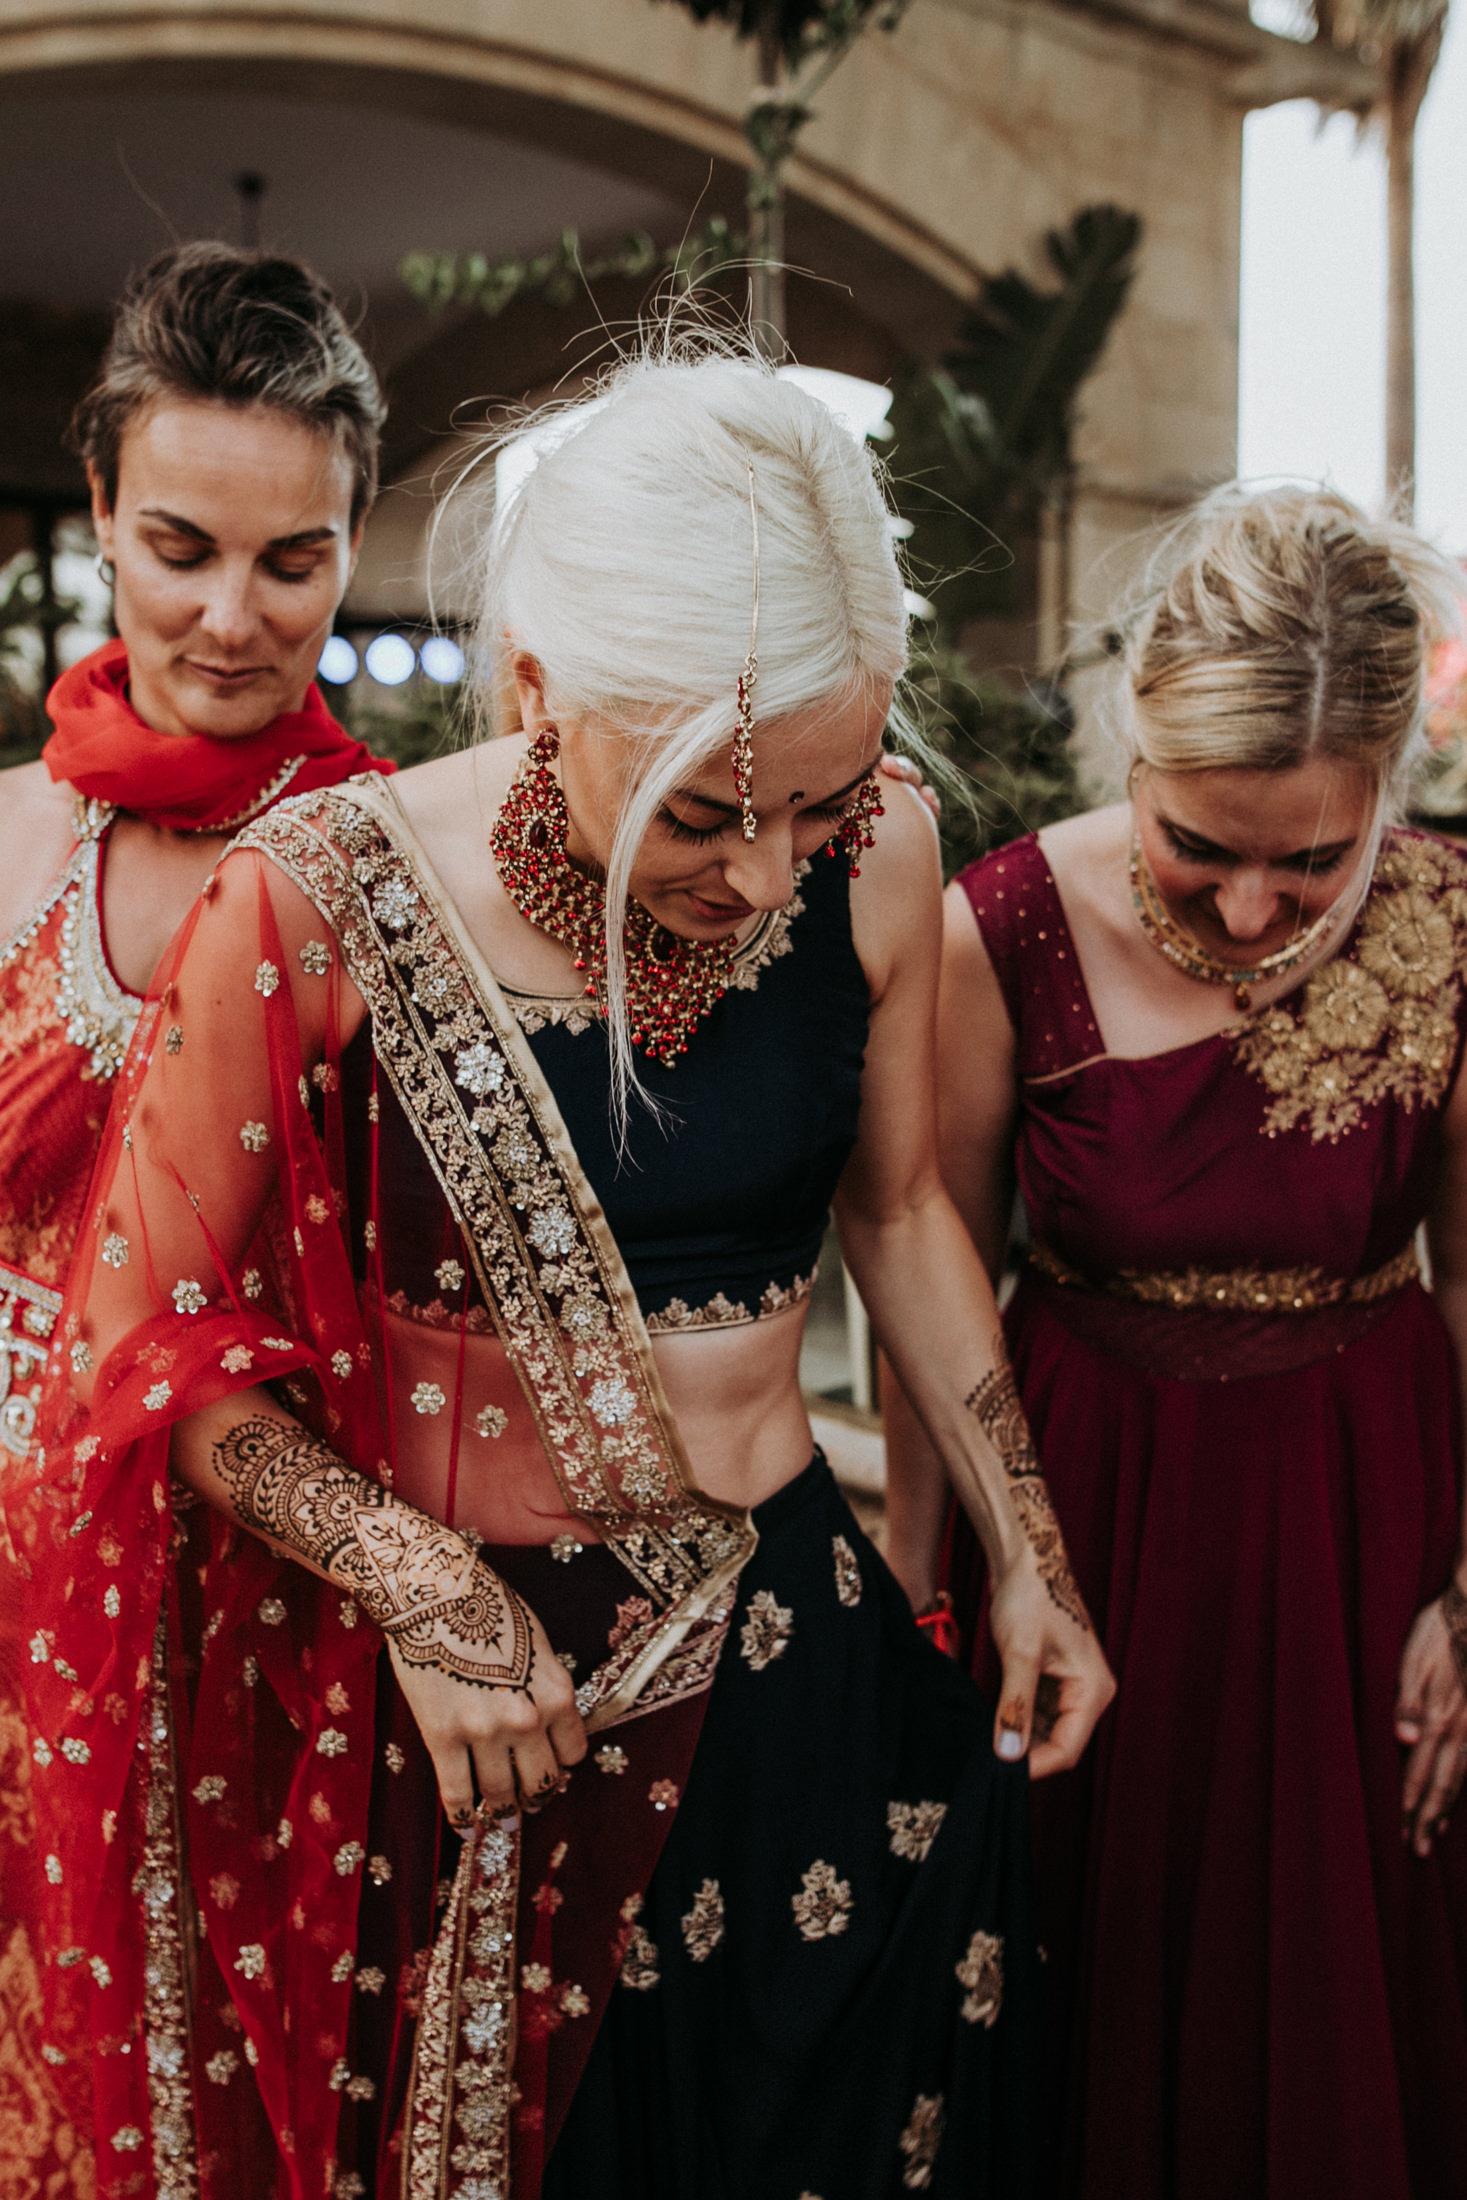 Wedding_Photographer_Mallorca_Daniela-Marquardt_Photography_New_York_Iceland_Tuscany_Santorini_Portugal_Austria_Bavaria_Elopement_Hochzeitsfotograf_AntjeRajat1_46